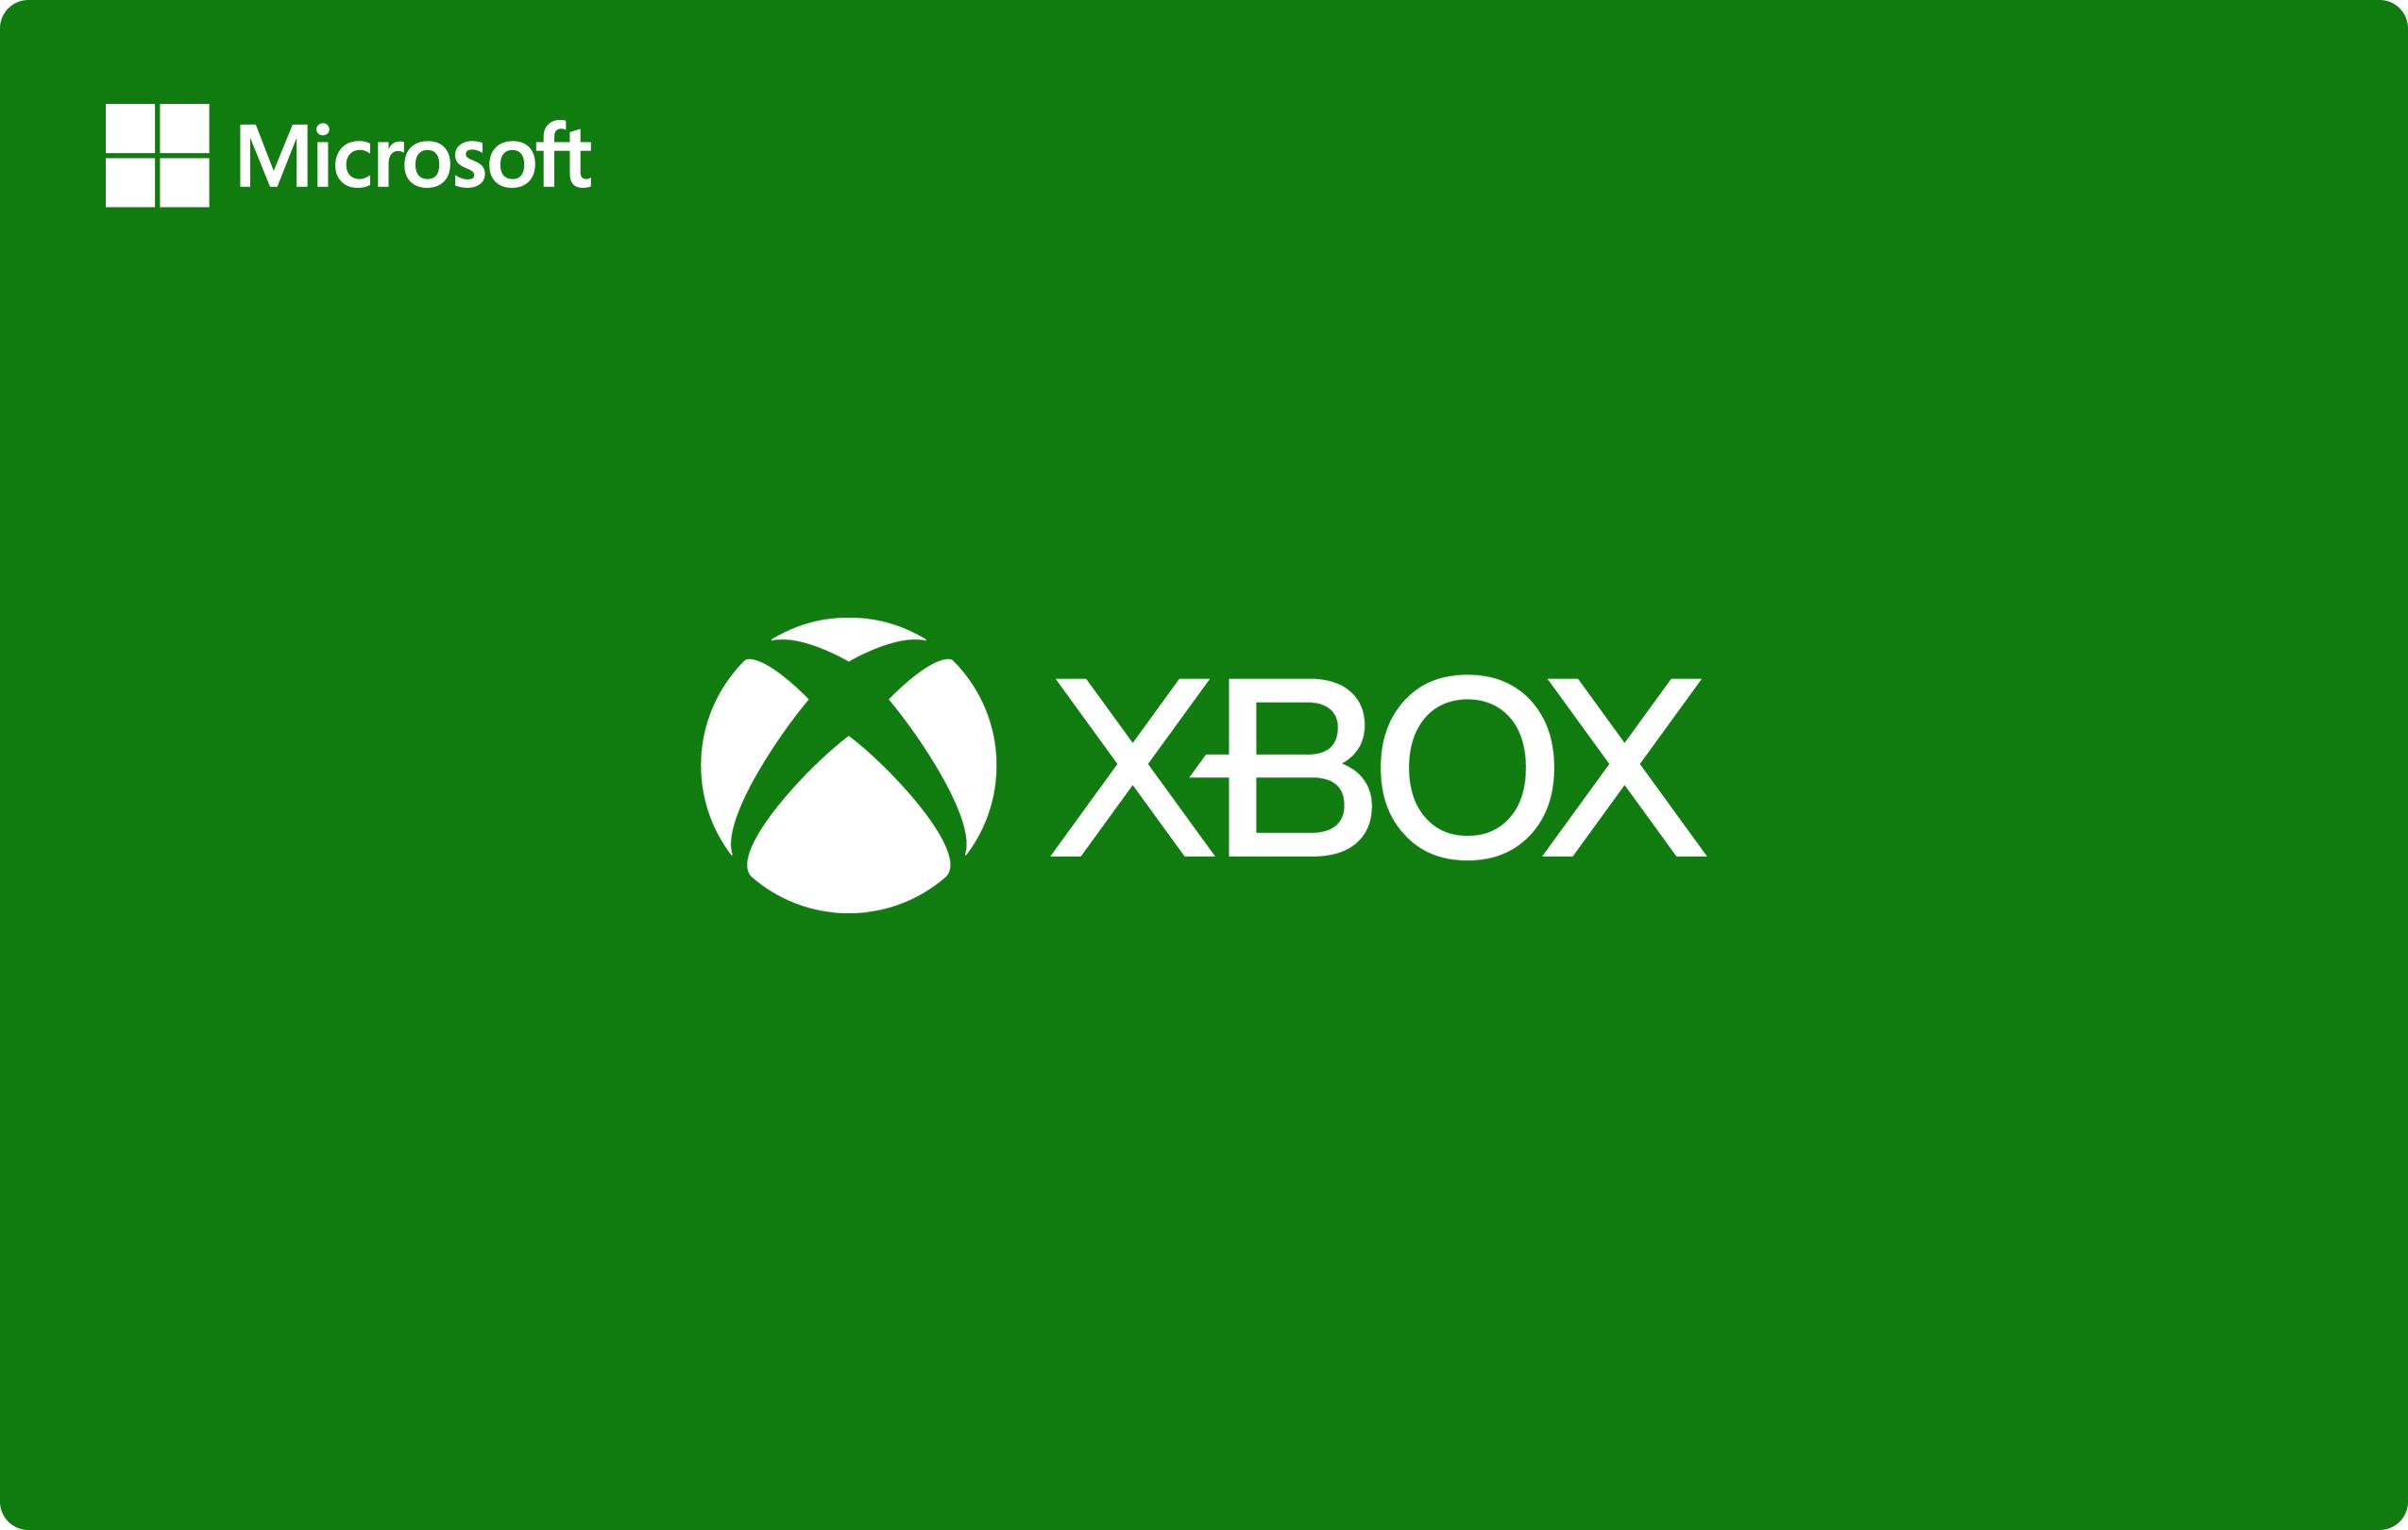 Xbox Live £15 eGift card image